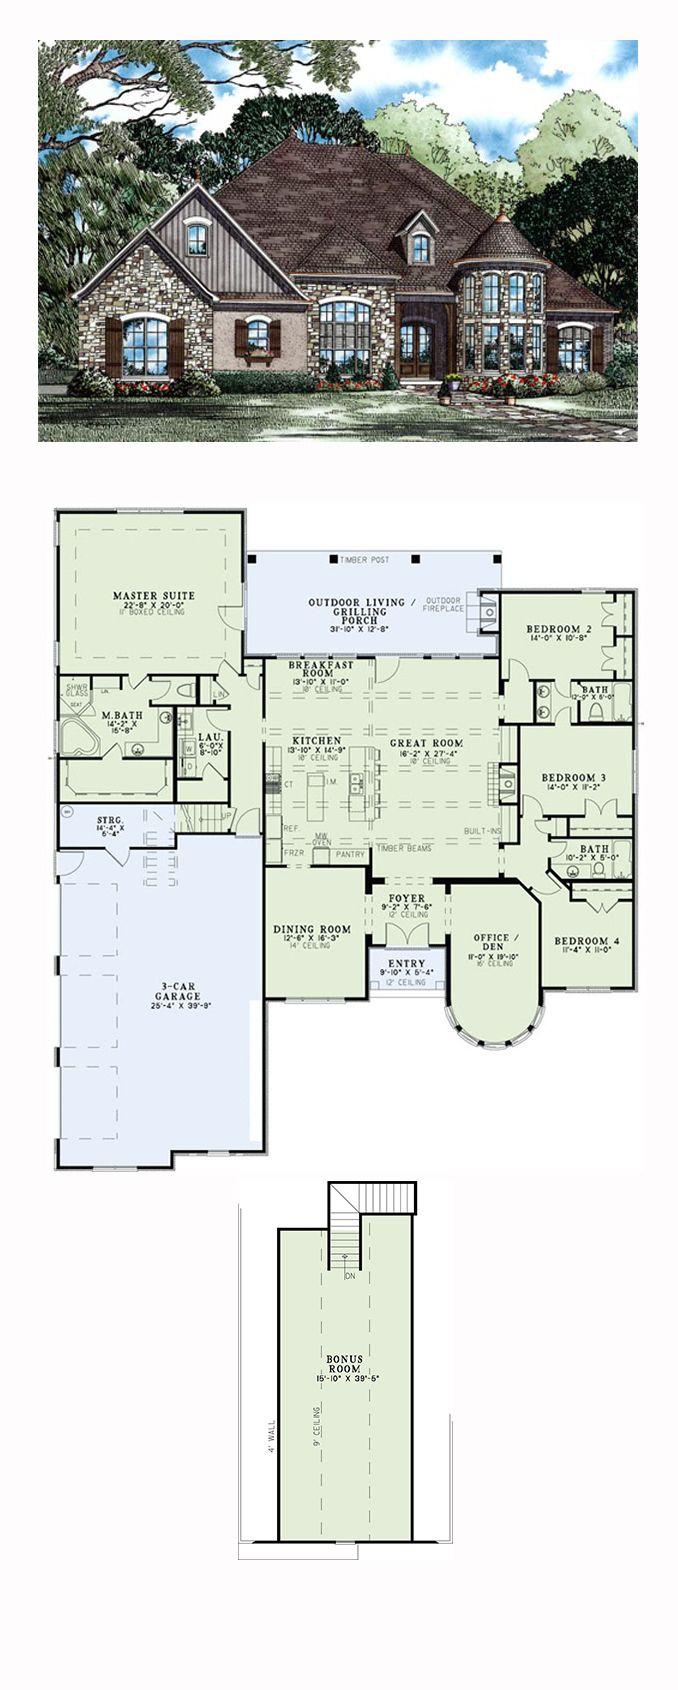 craftsman european house plan 82163 european house plans and craftsman european house plan 82163 european house plans and bedrooms